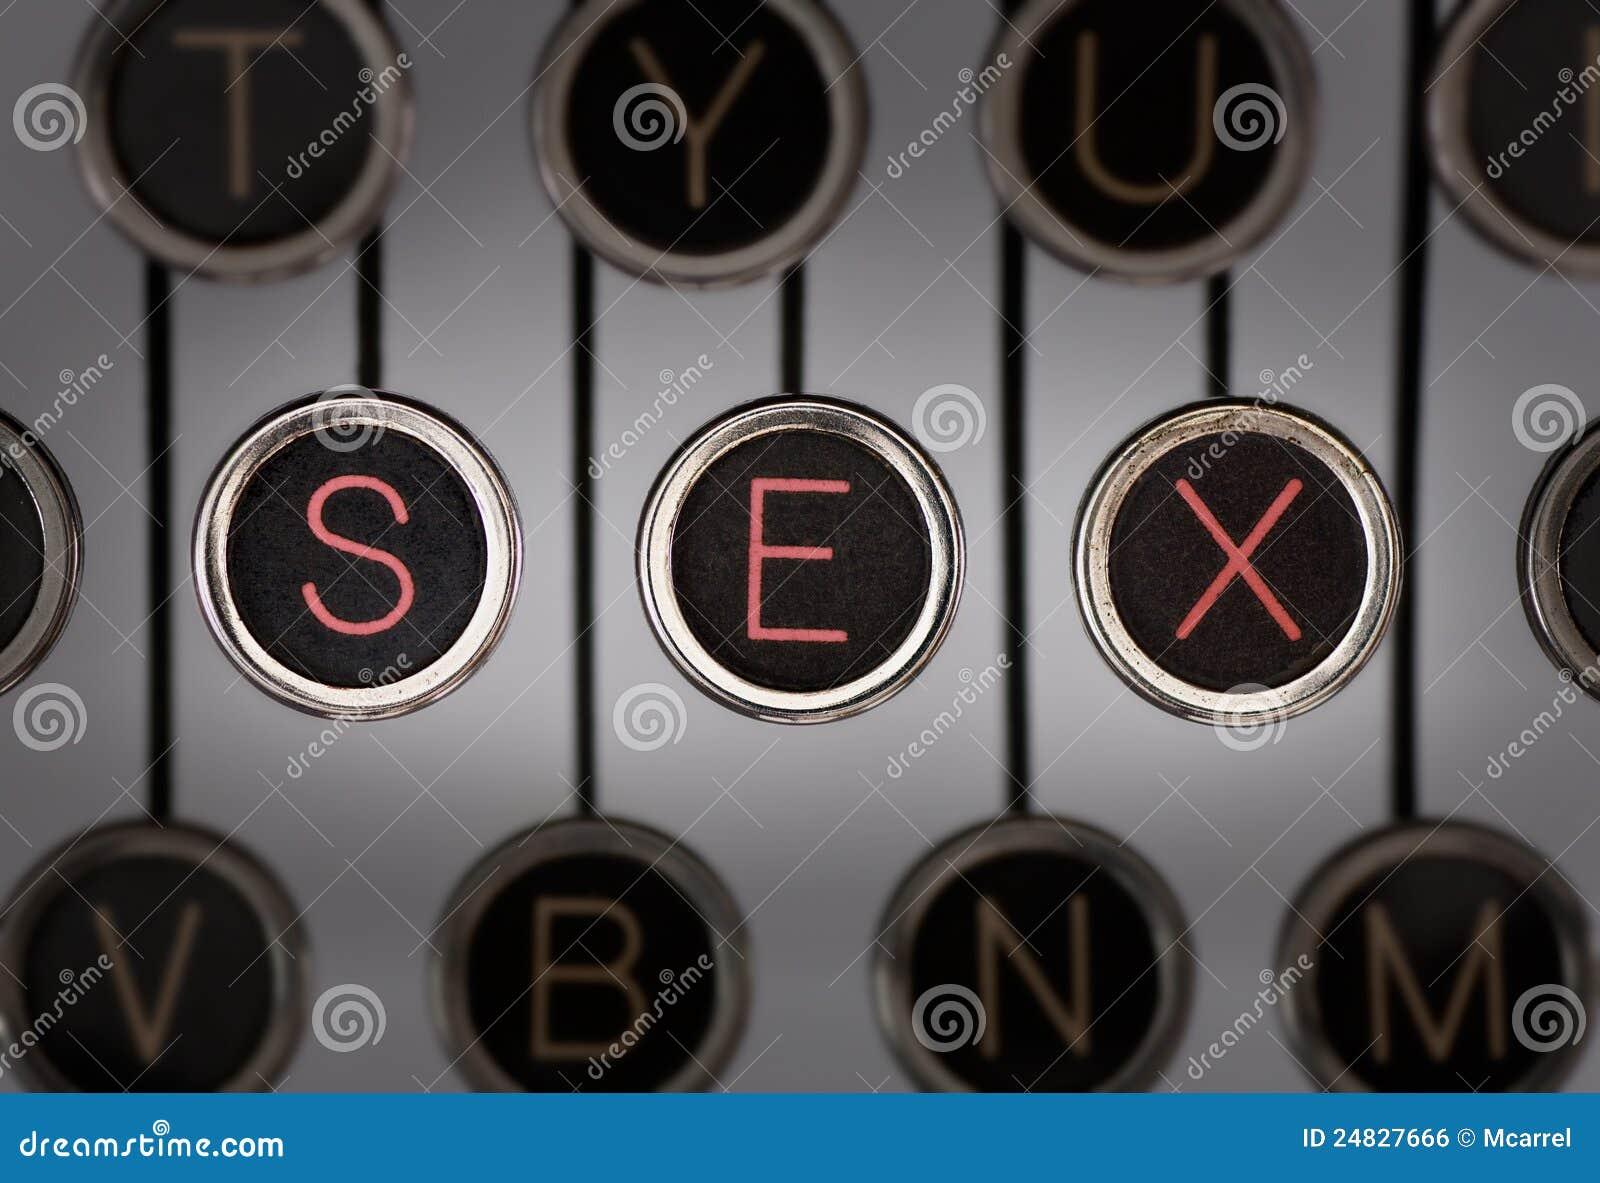 Gratis seksfilms mobiel dildo anal